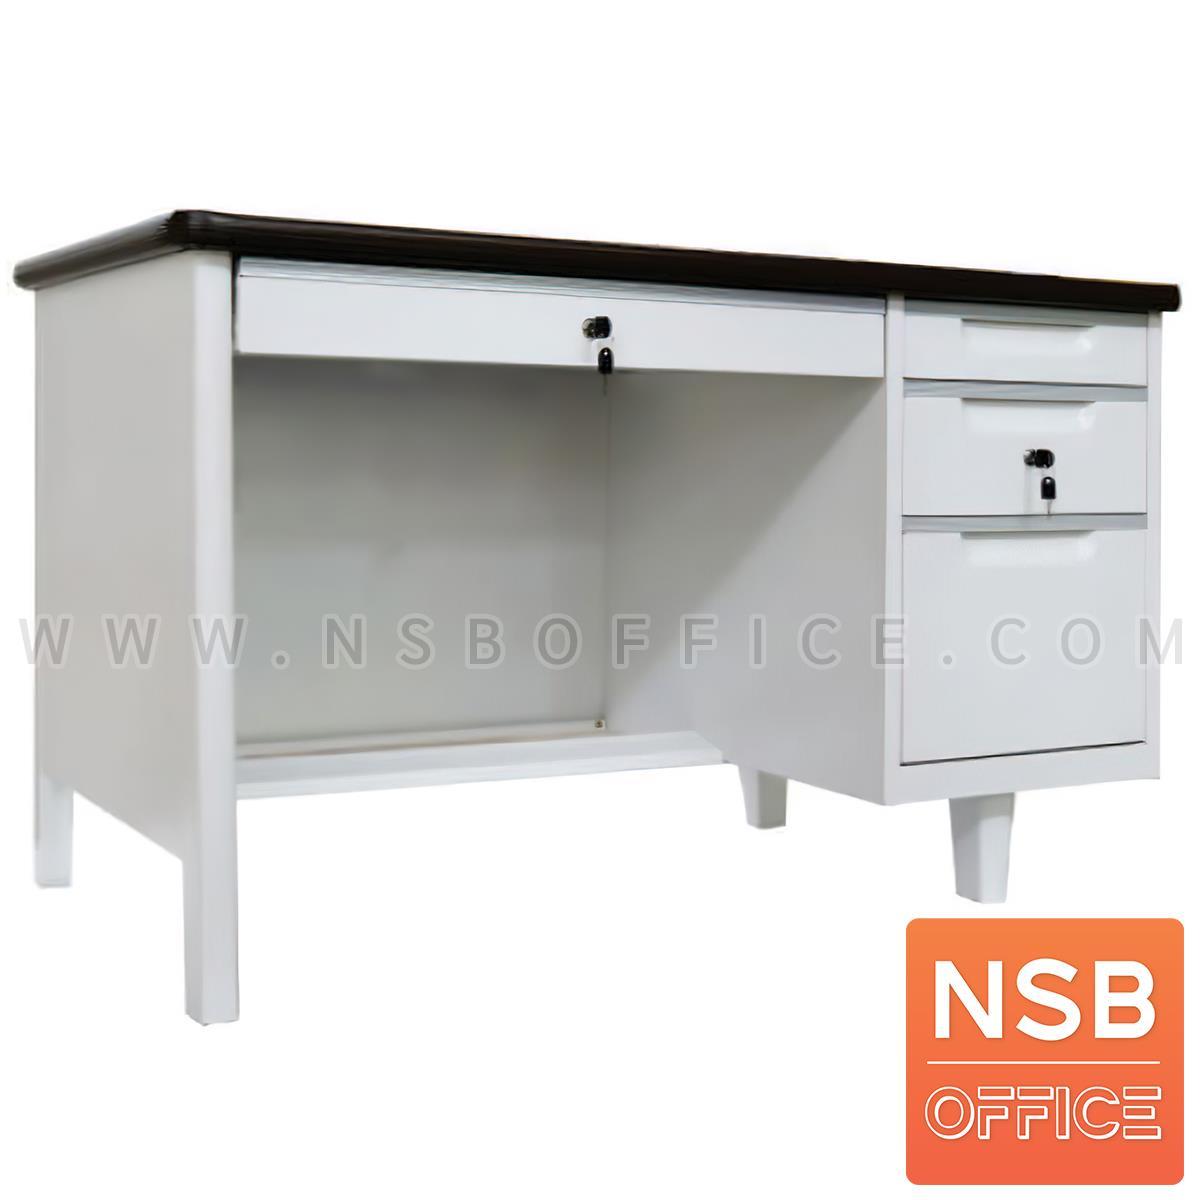 E02A057:โต๊ะทำงานหน้าเหล็ก 3 ลิ้นชัก รุ่น Mixmaster (มิกซ์มาสเตอร์) ขนาด 122.7W ซม. (4 ฟุต)